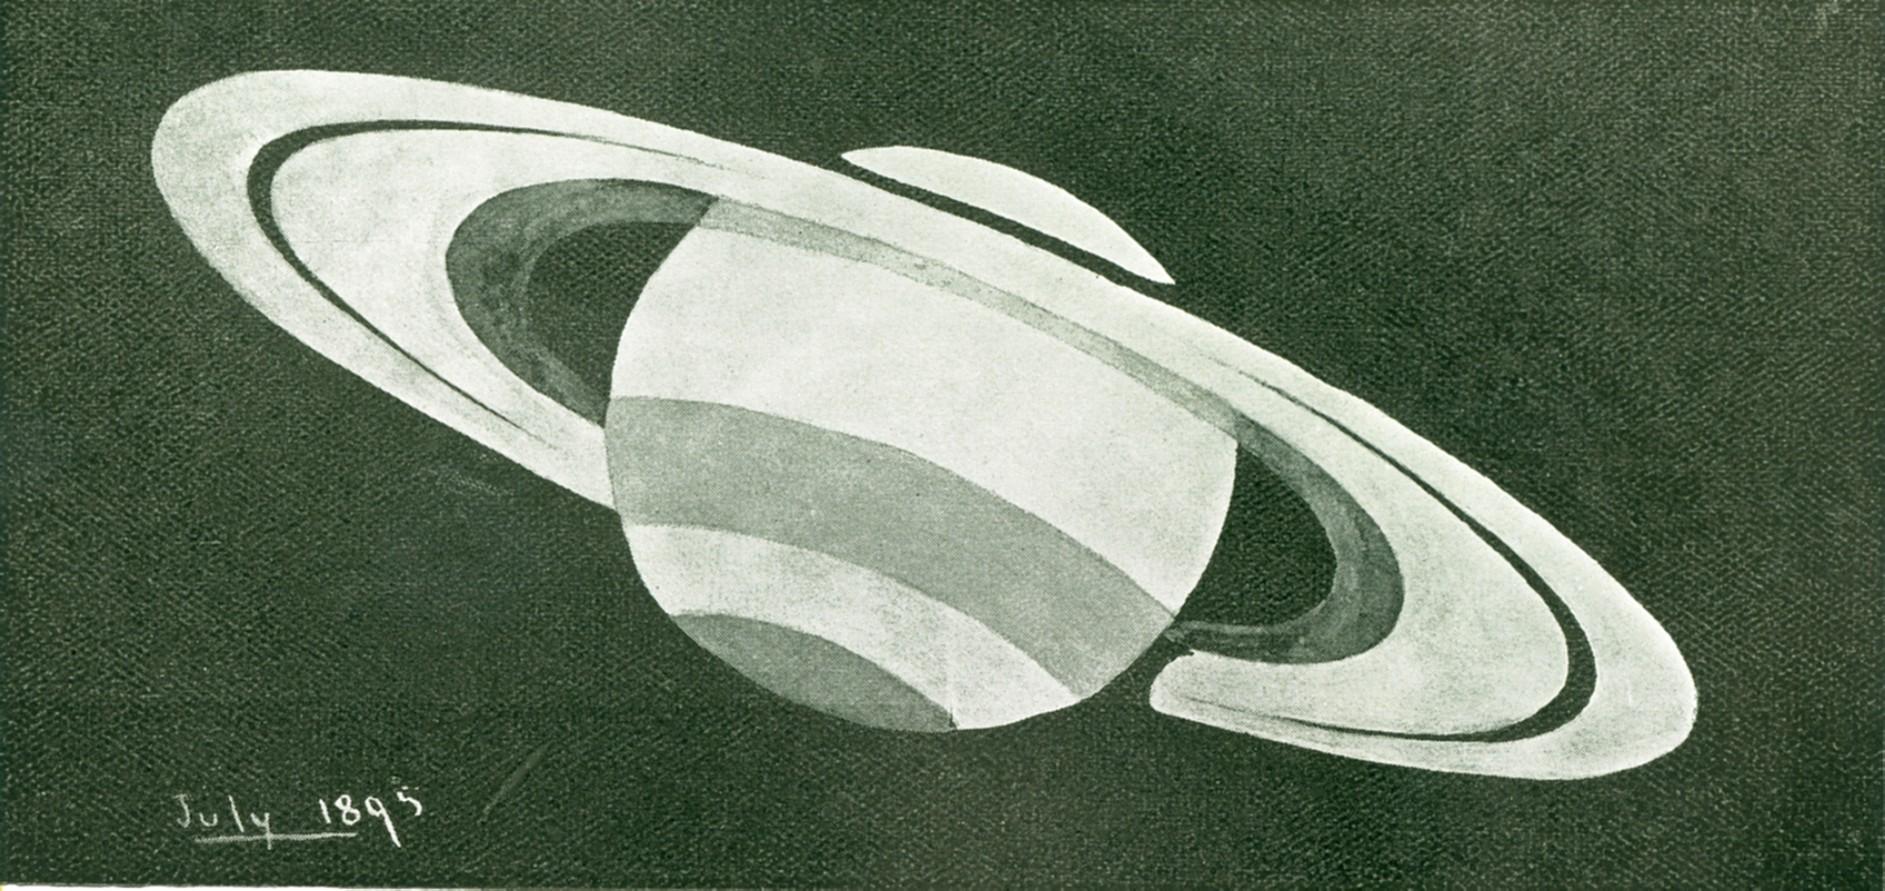 Saturn Sketch 1895